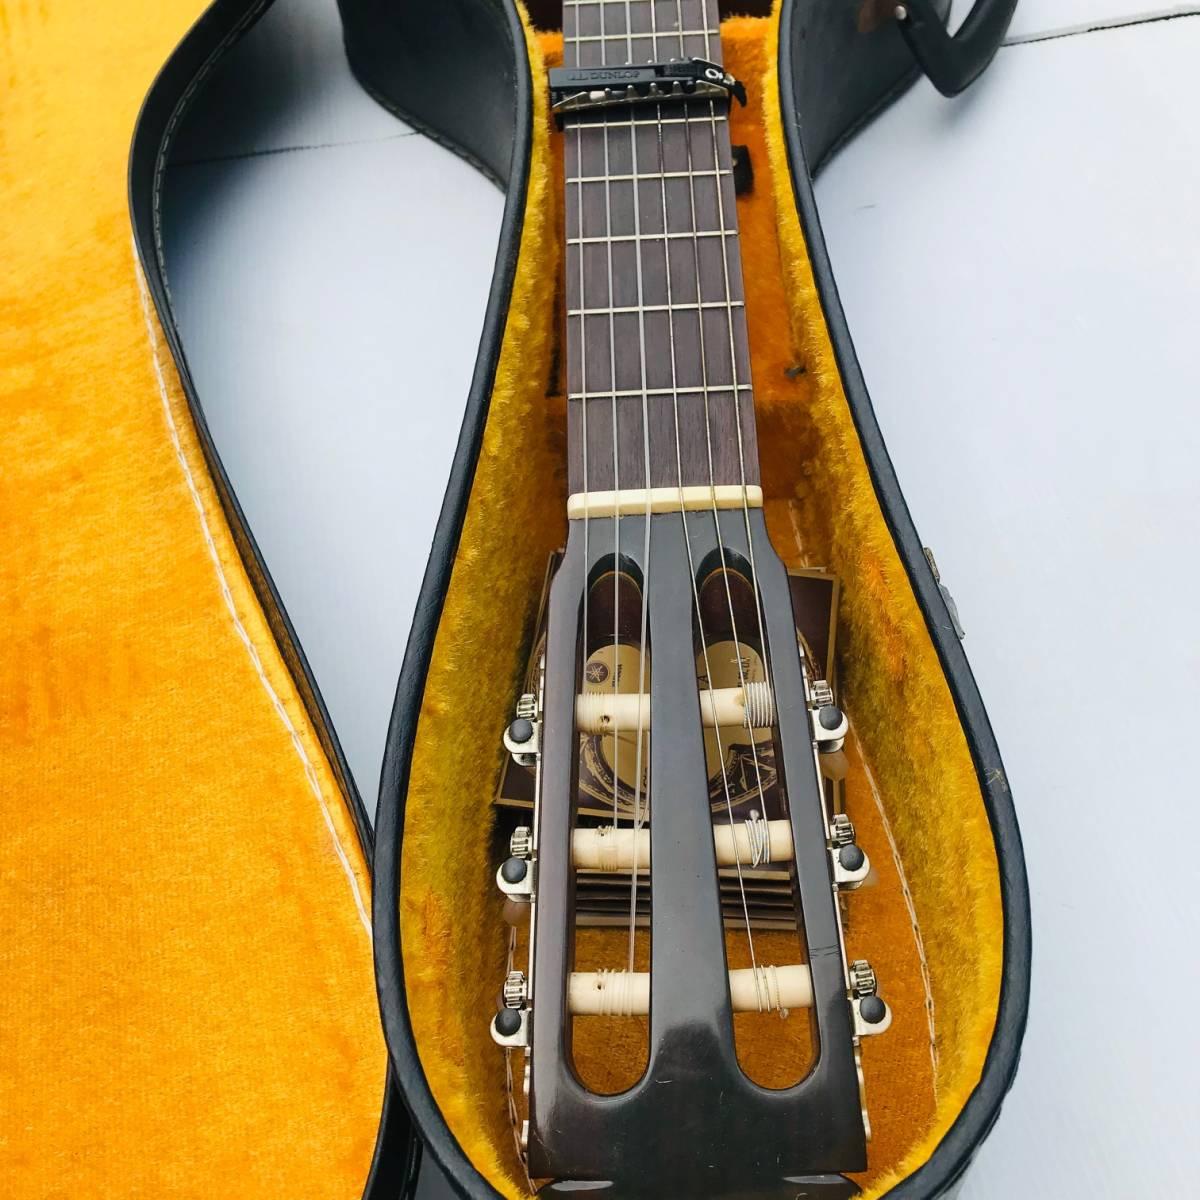 RYOJI MATSUOKA 松岡良治 ギター LUTHIER NO.25 1972年 NAGOYA JAPON クラシックギター ハードケース付【現状品】_画像5